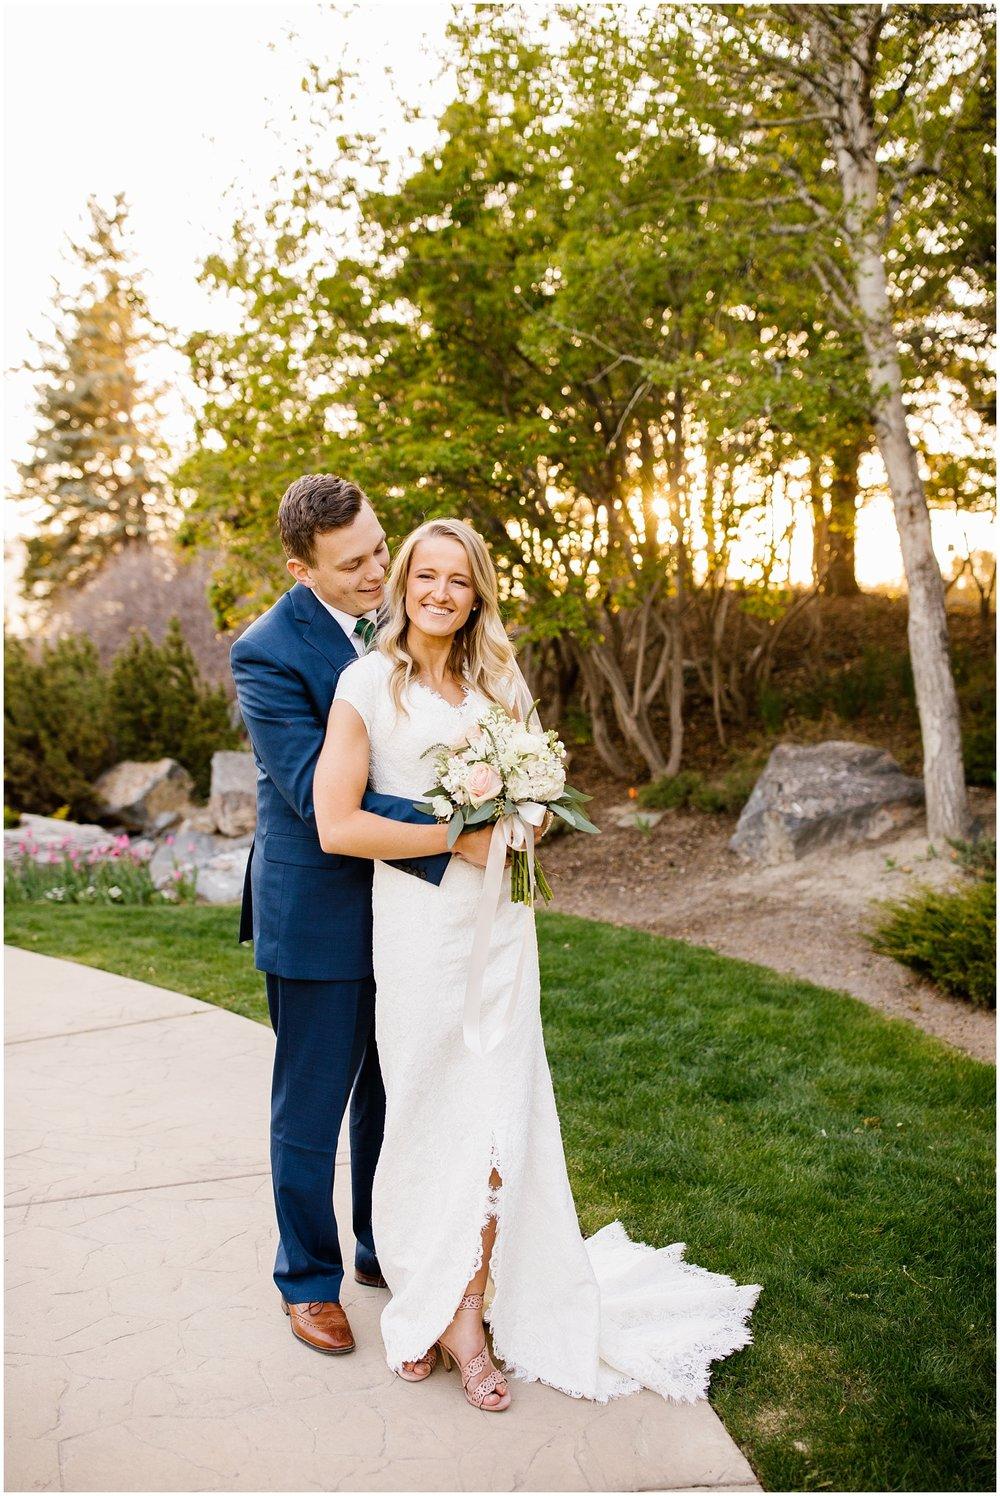 TA-Bridals-54_Lizzie-B-Imagery-Utah-Wedding-Photographer-Park-City-Salt-Lake-City-Thanksgiving-Point-Ashton-Gardens-Lehi-Utah.jpg